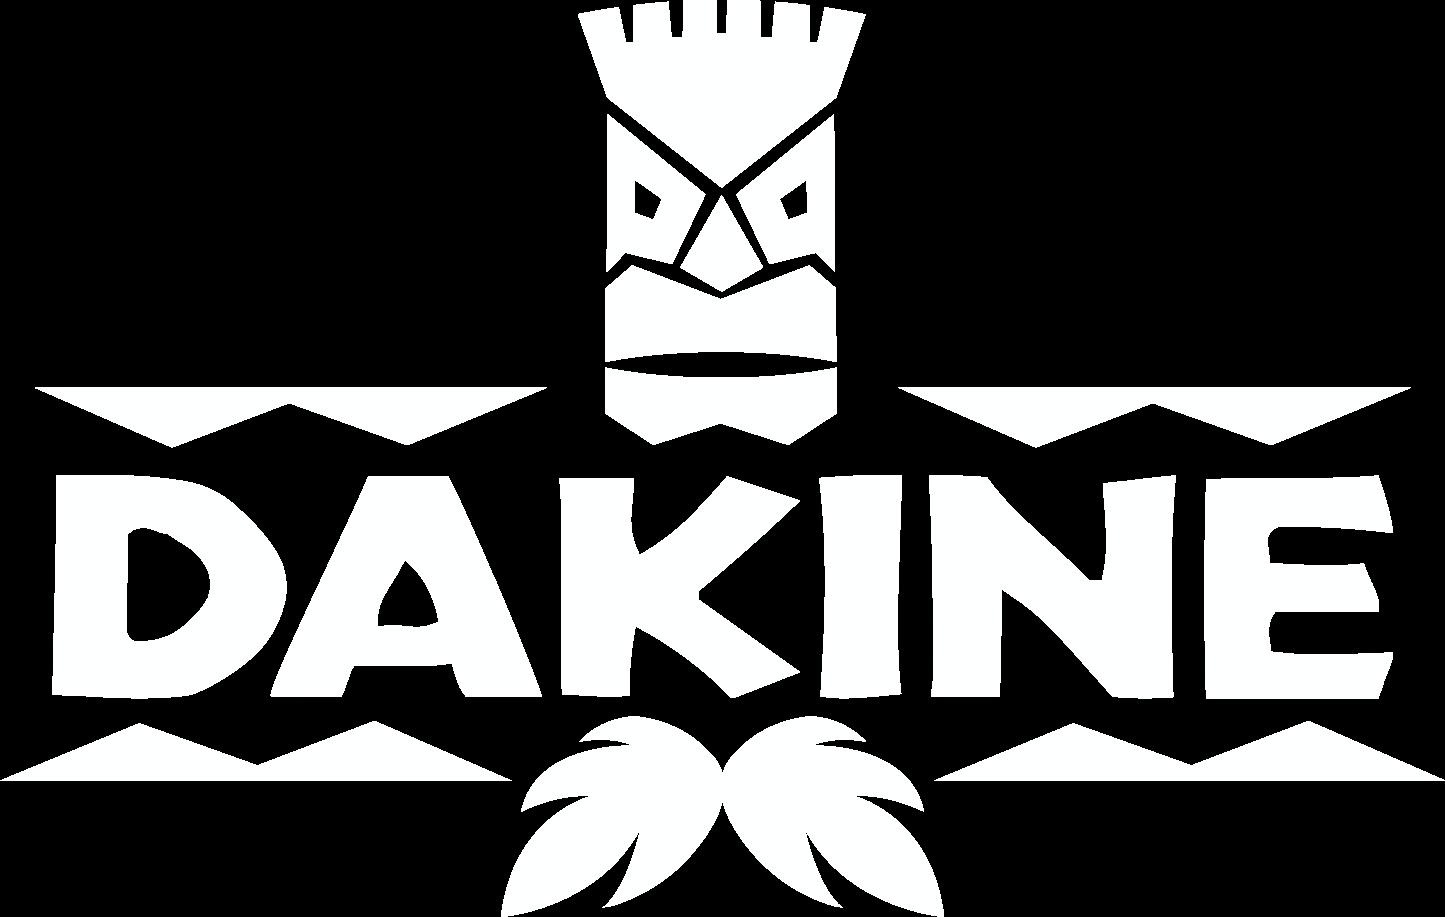 Dakine CBD & Hemp Oil Products.